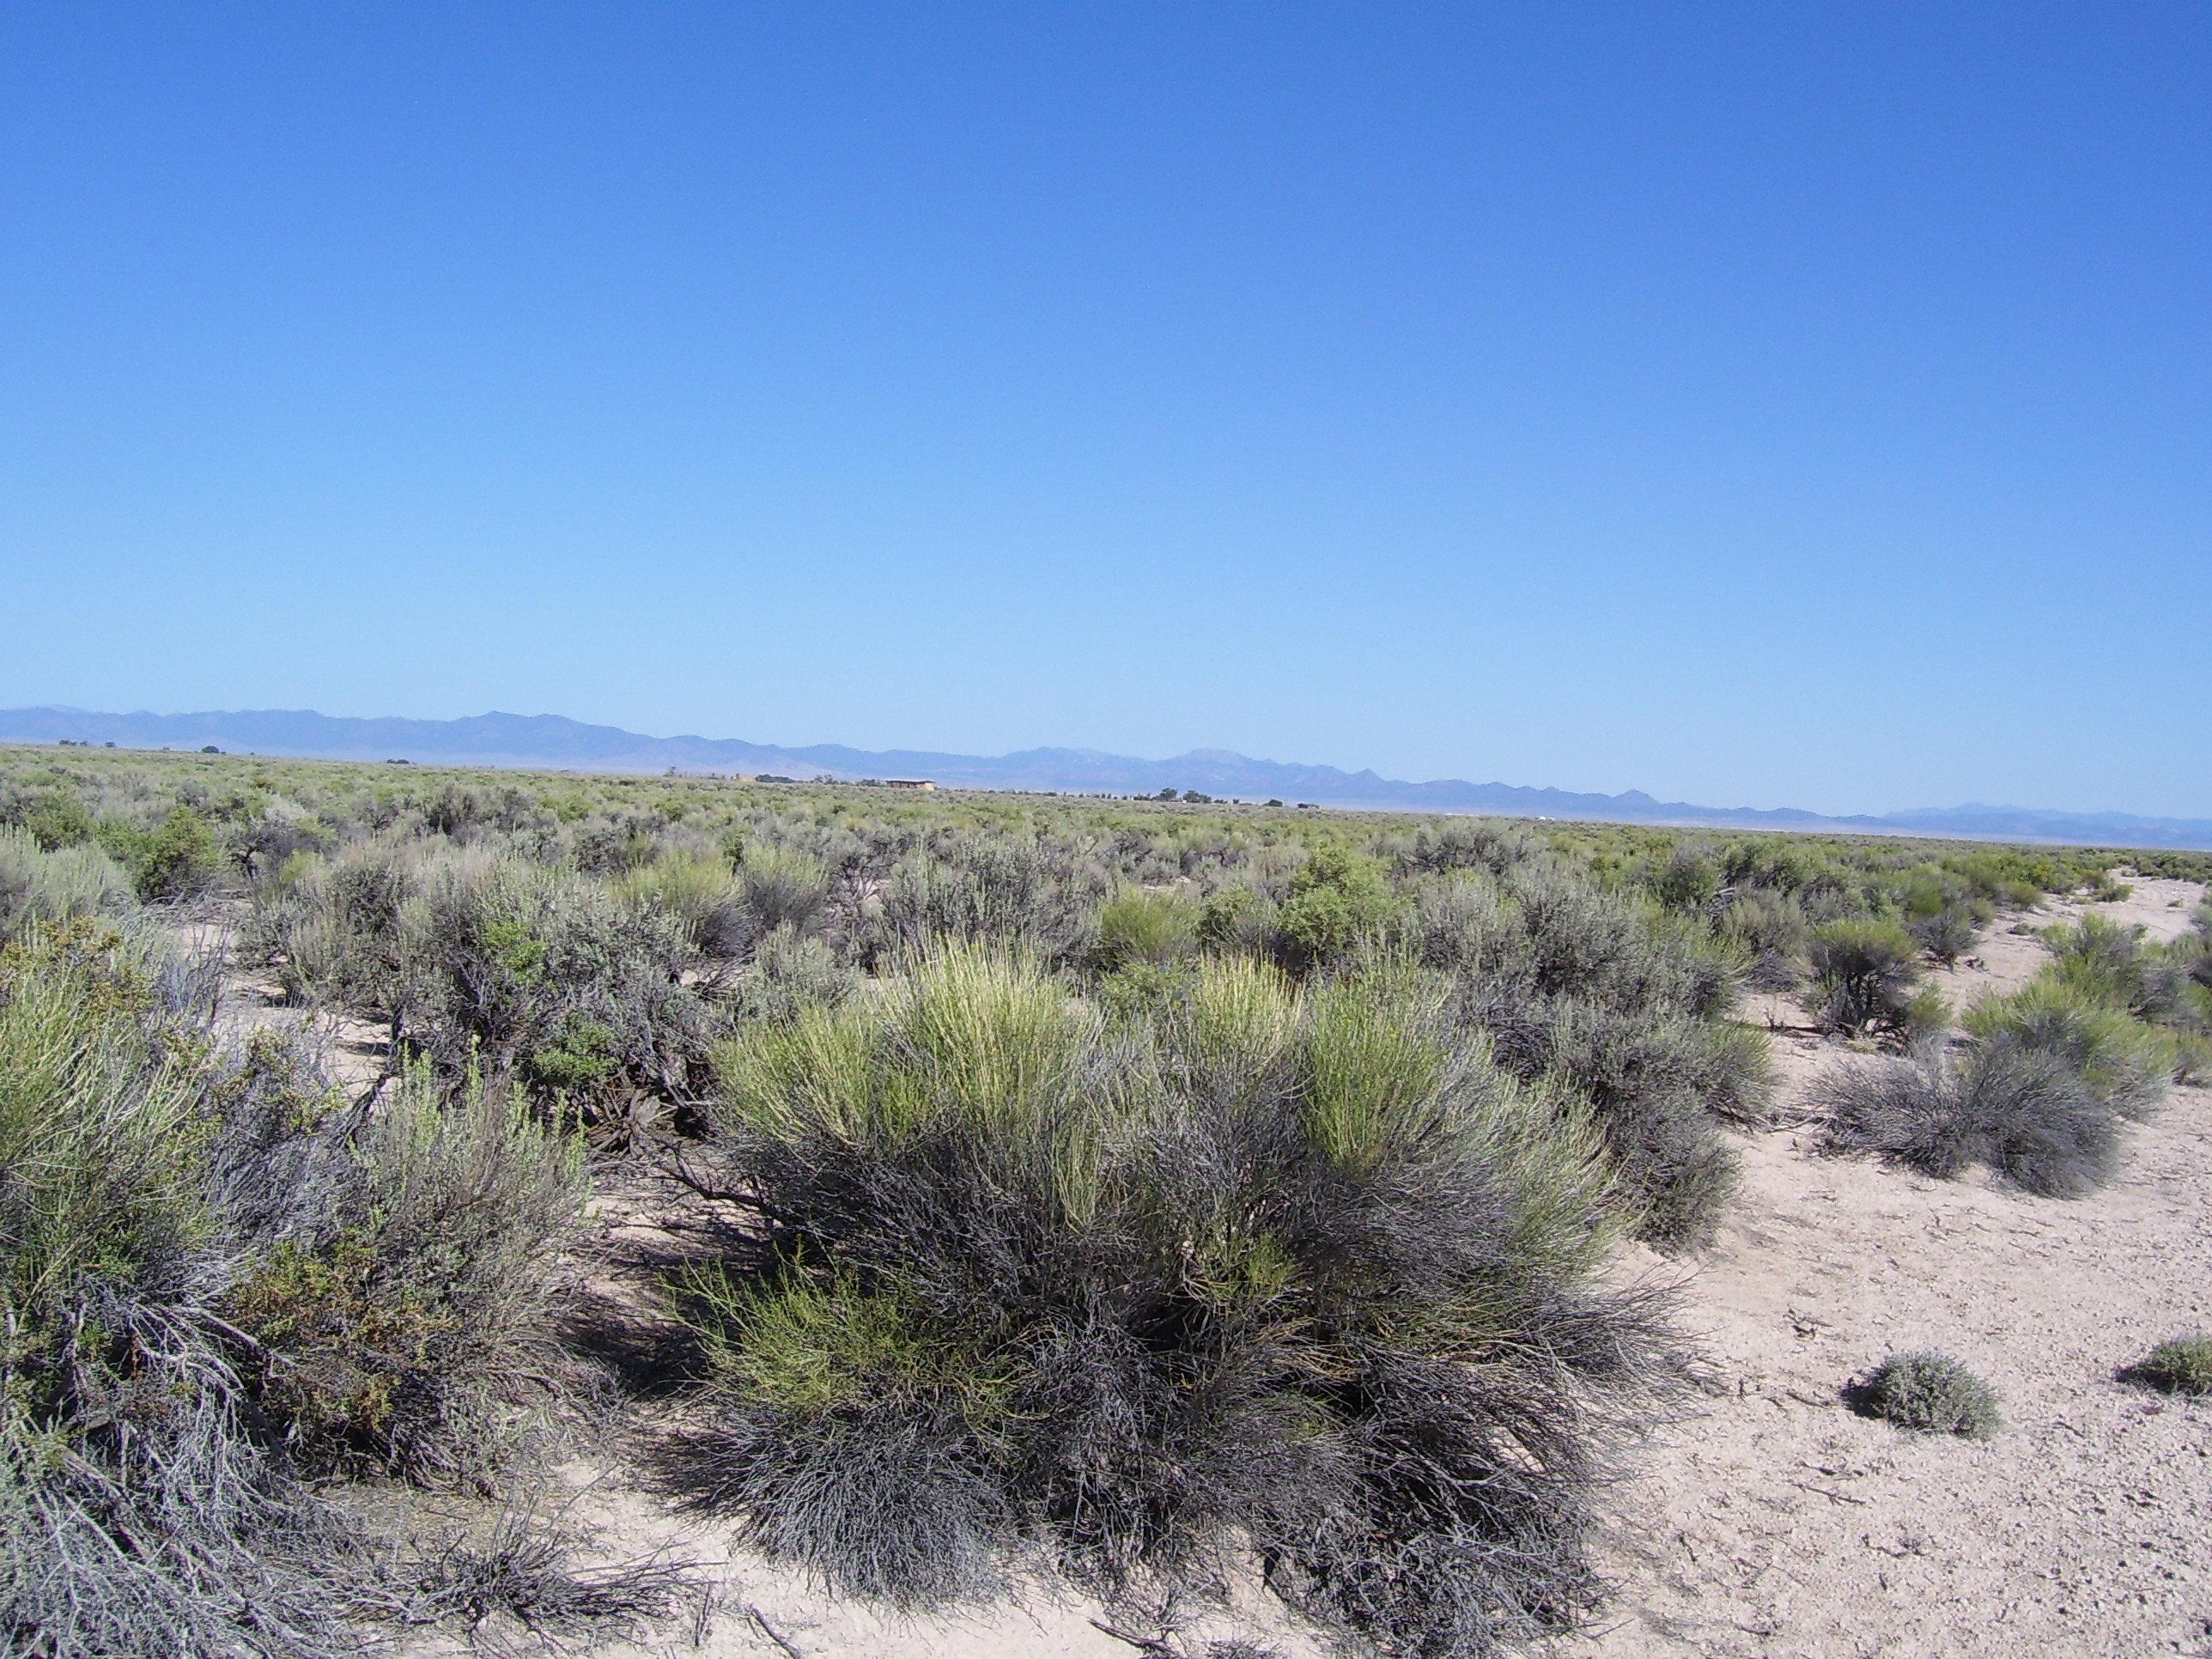 Iron County Utah Land For Sale 2 07 Acres E 1372 0168